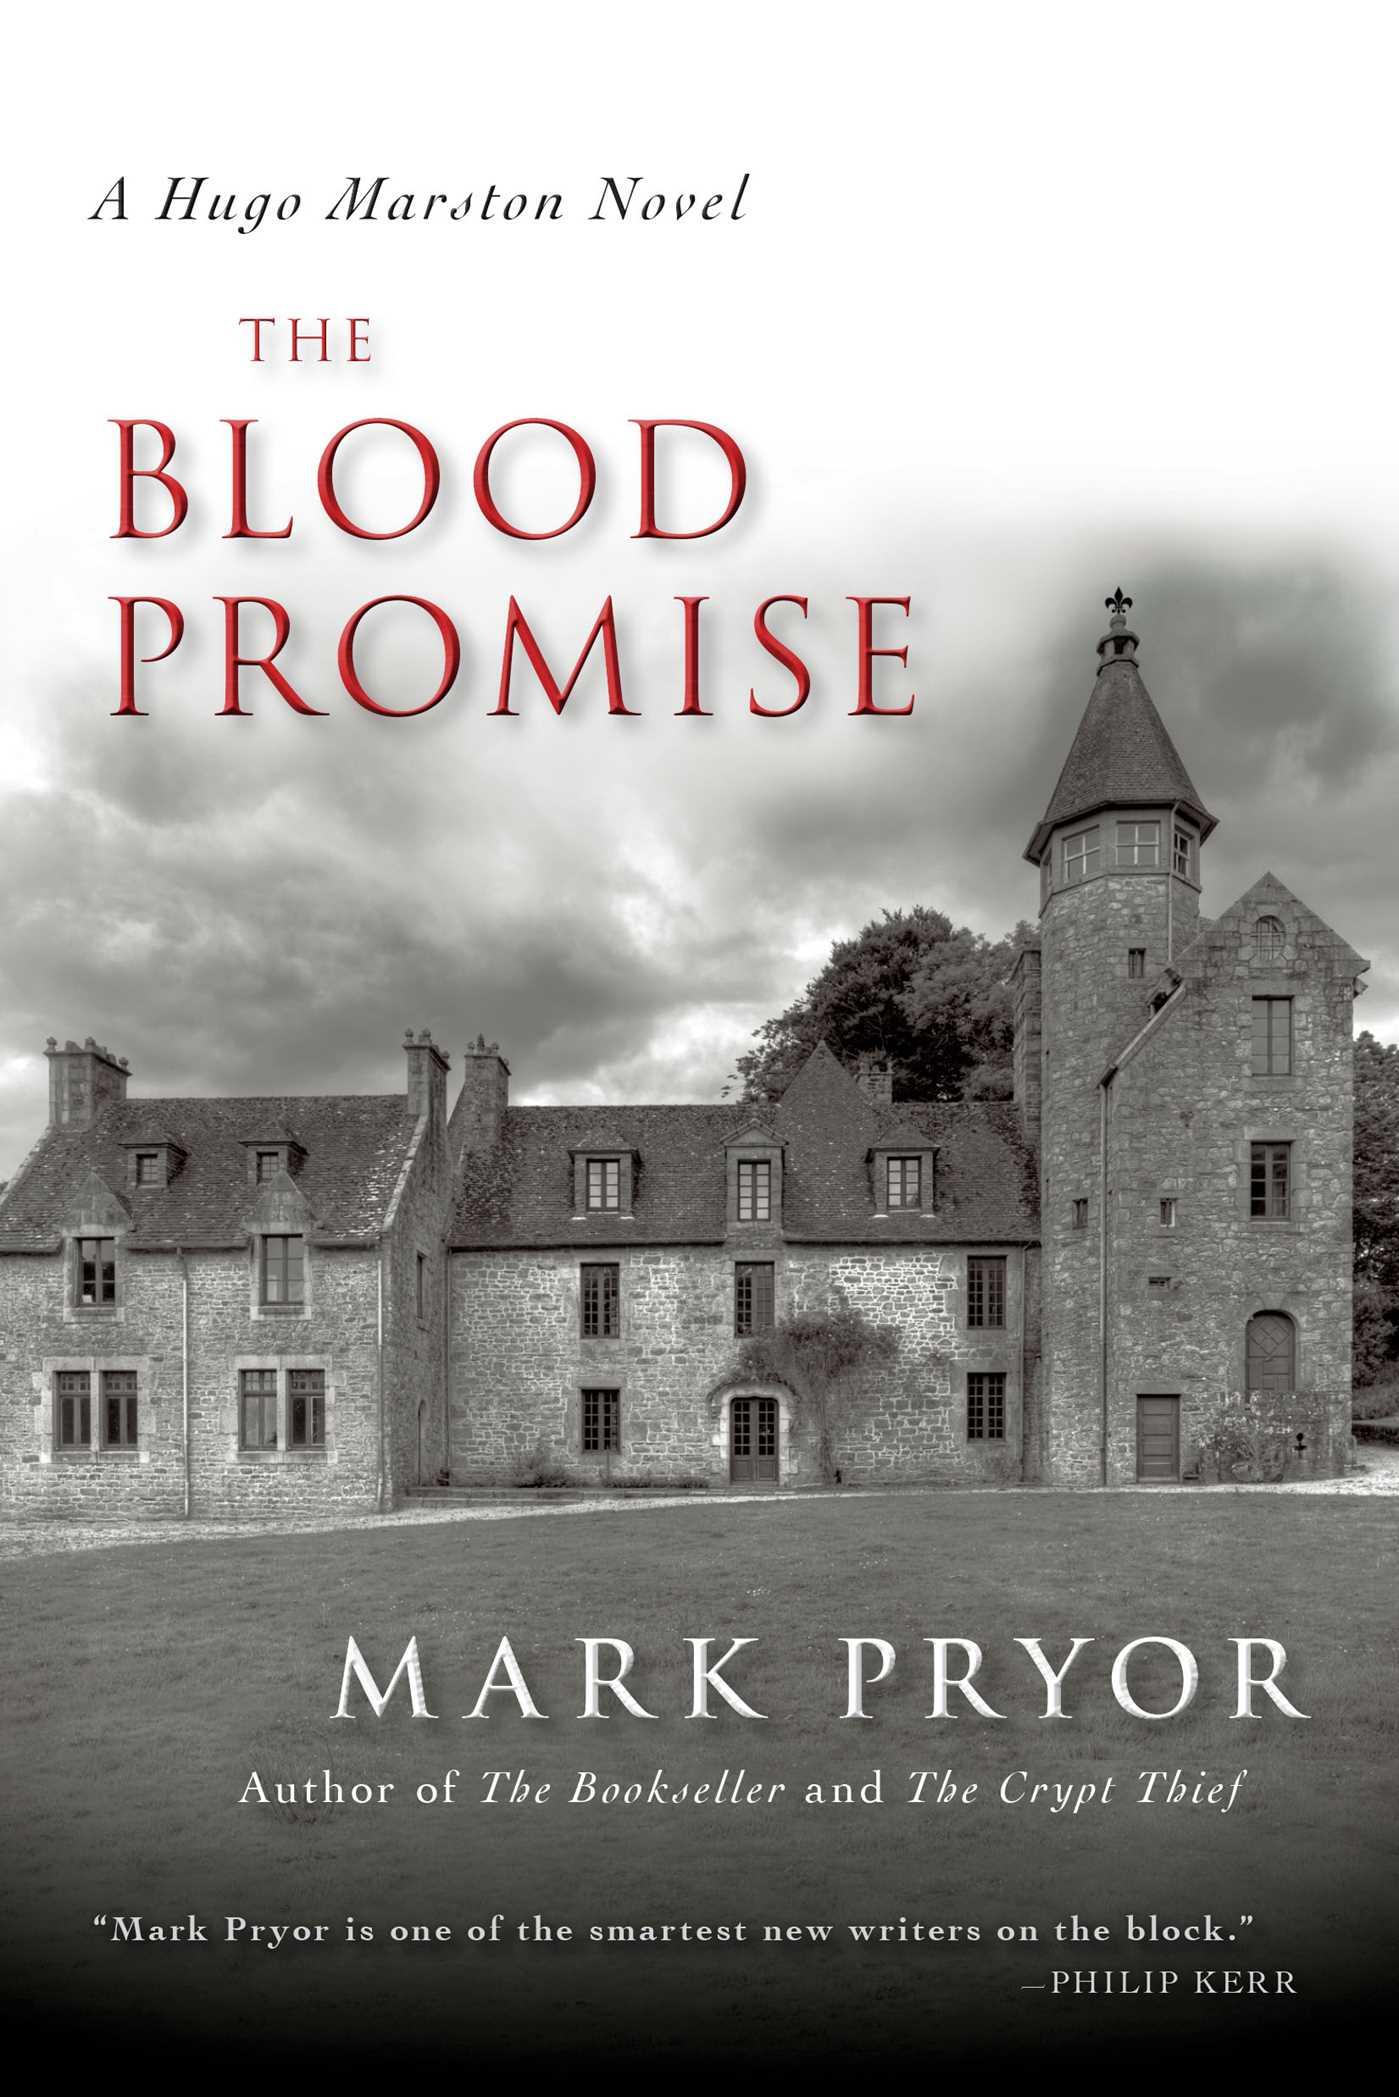 The Blood Promise A Hugo Marston Novel